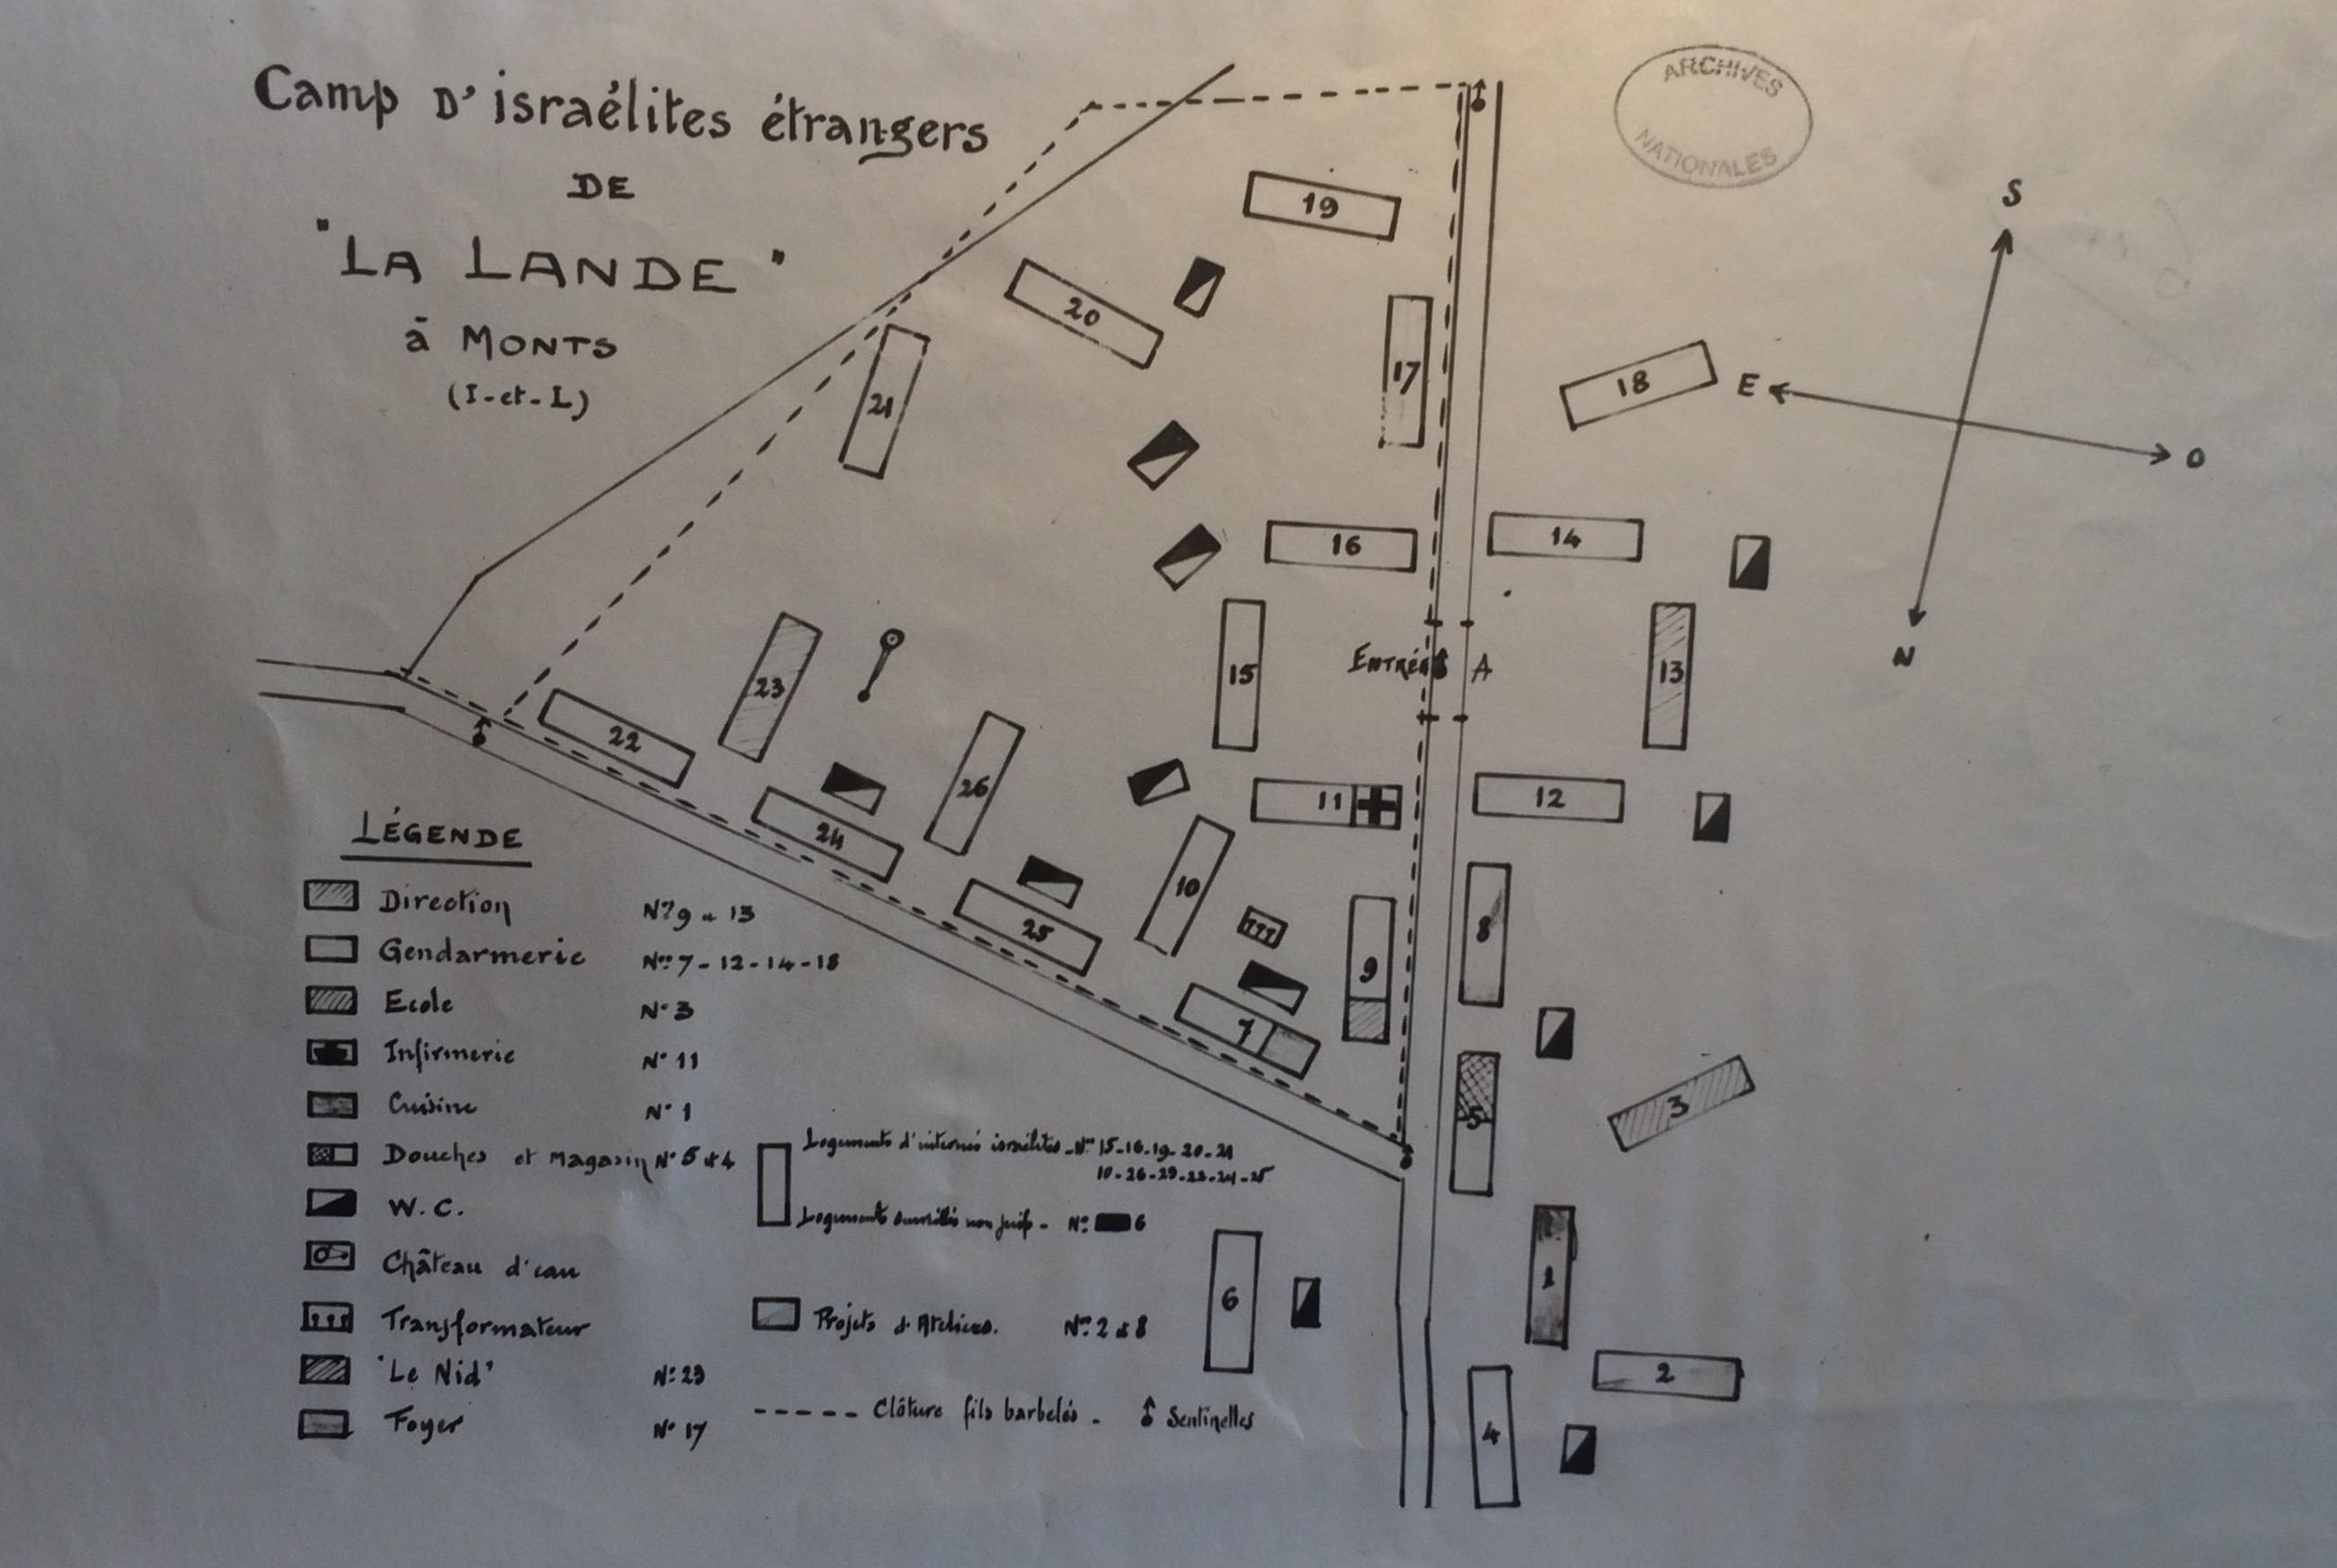 Plan Camp de La Lande [Archives Nationales, F7/15059]